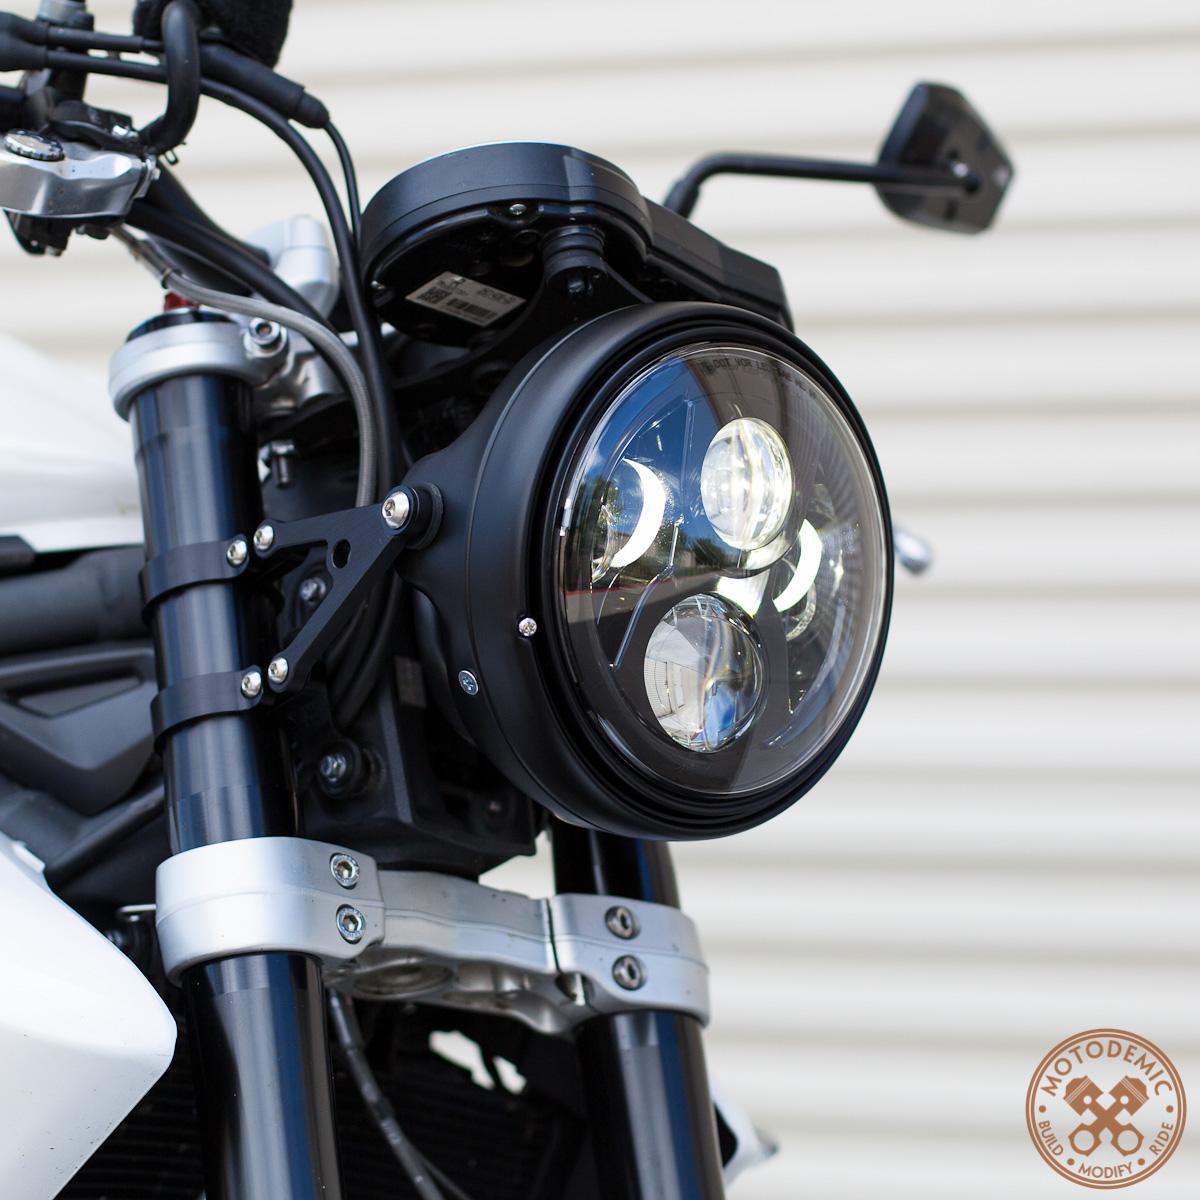 7 inch led headlight evo 2 � motodemic